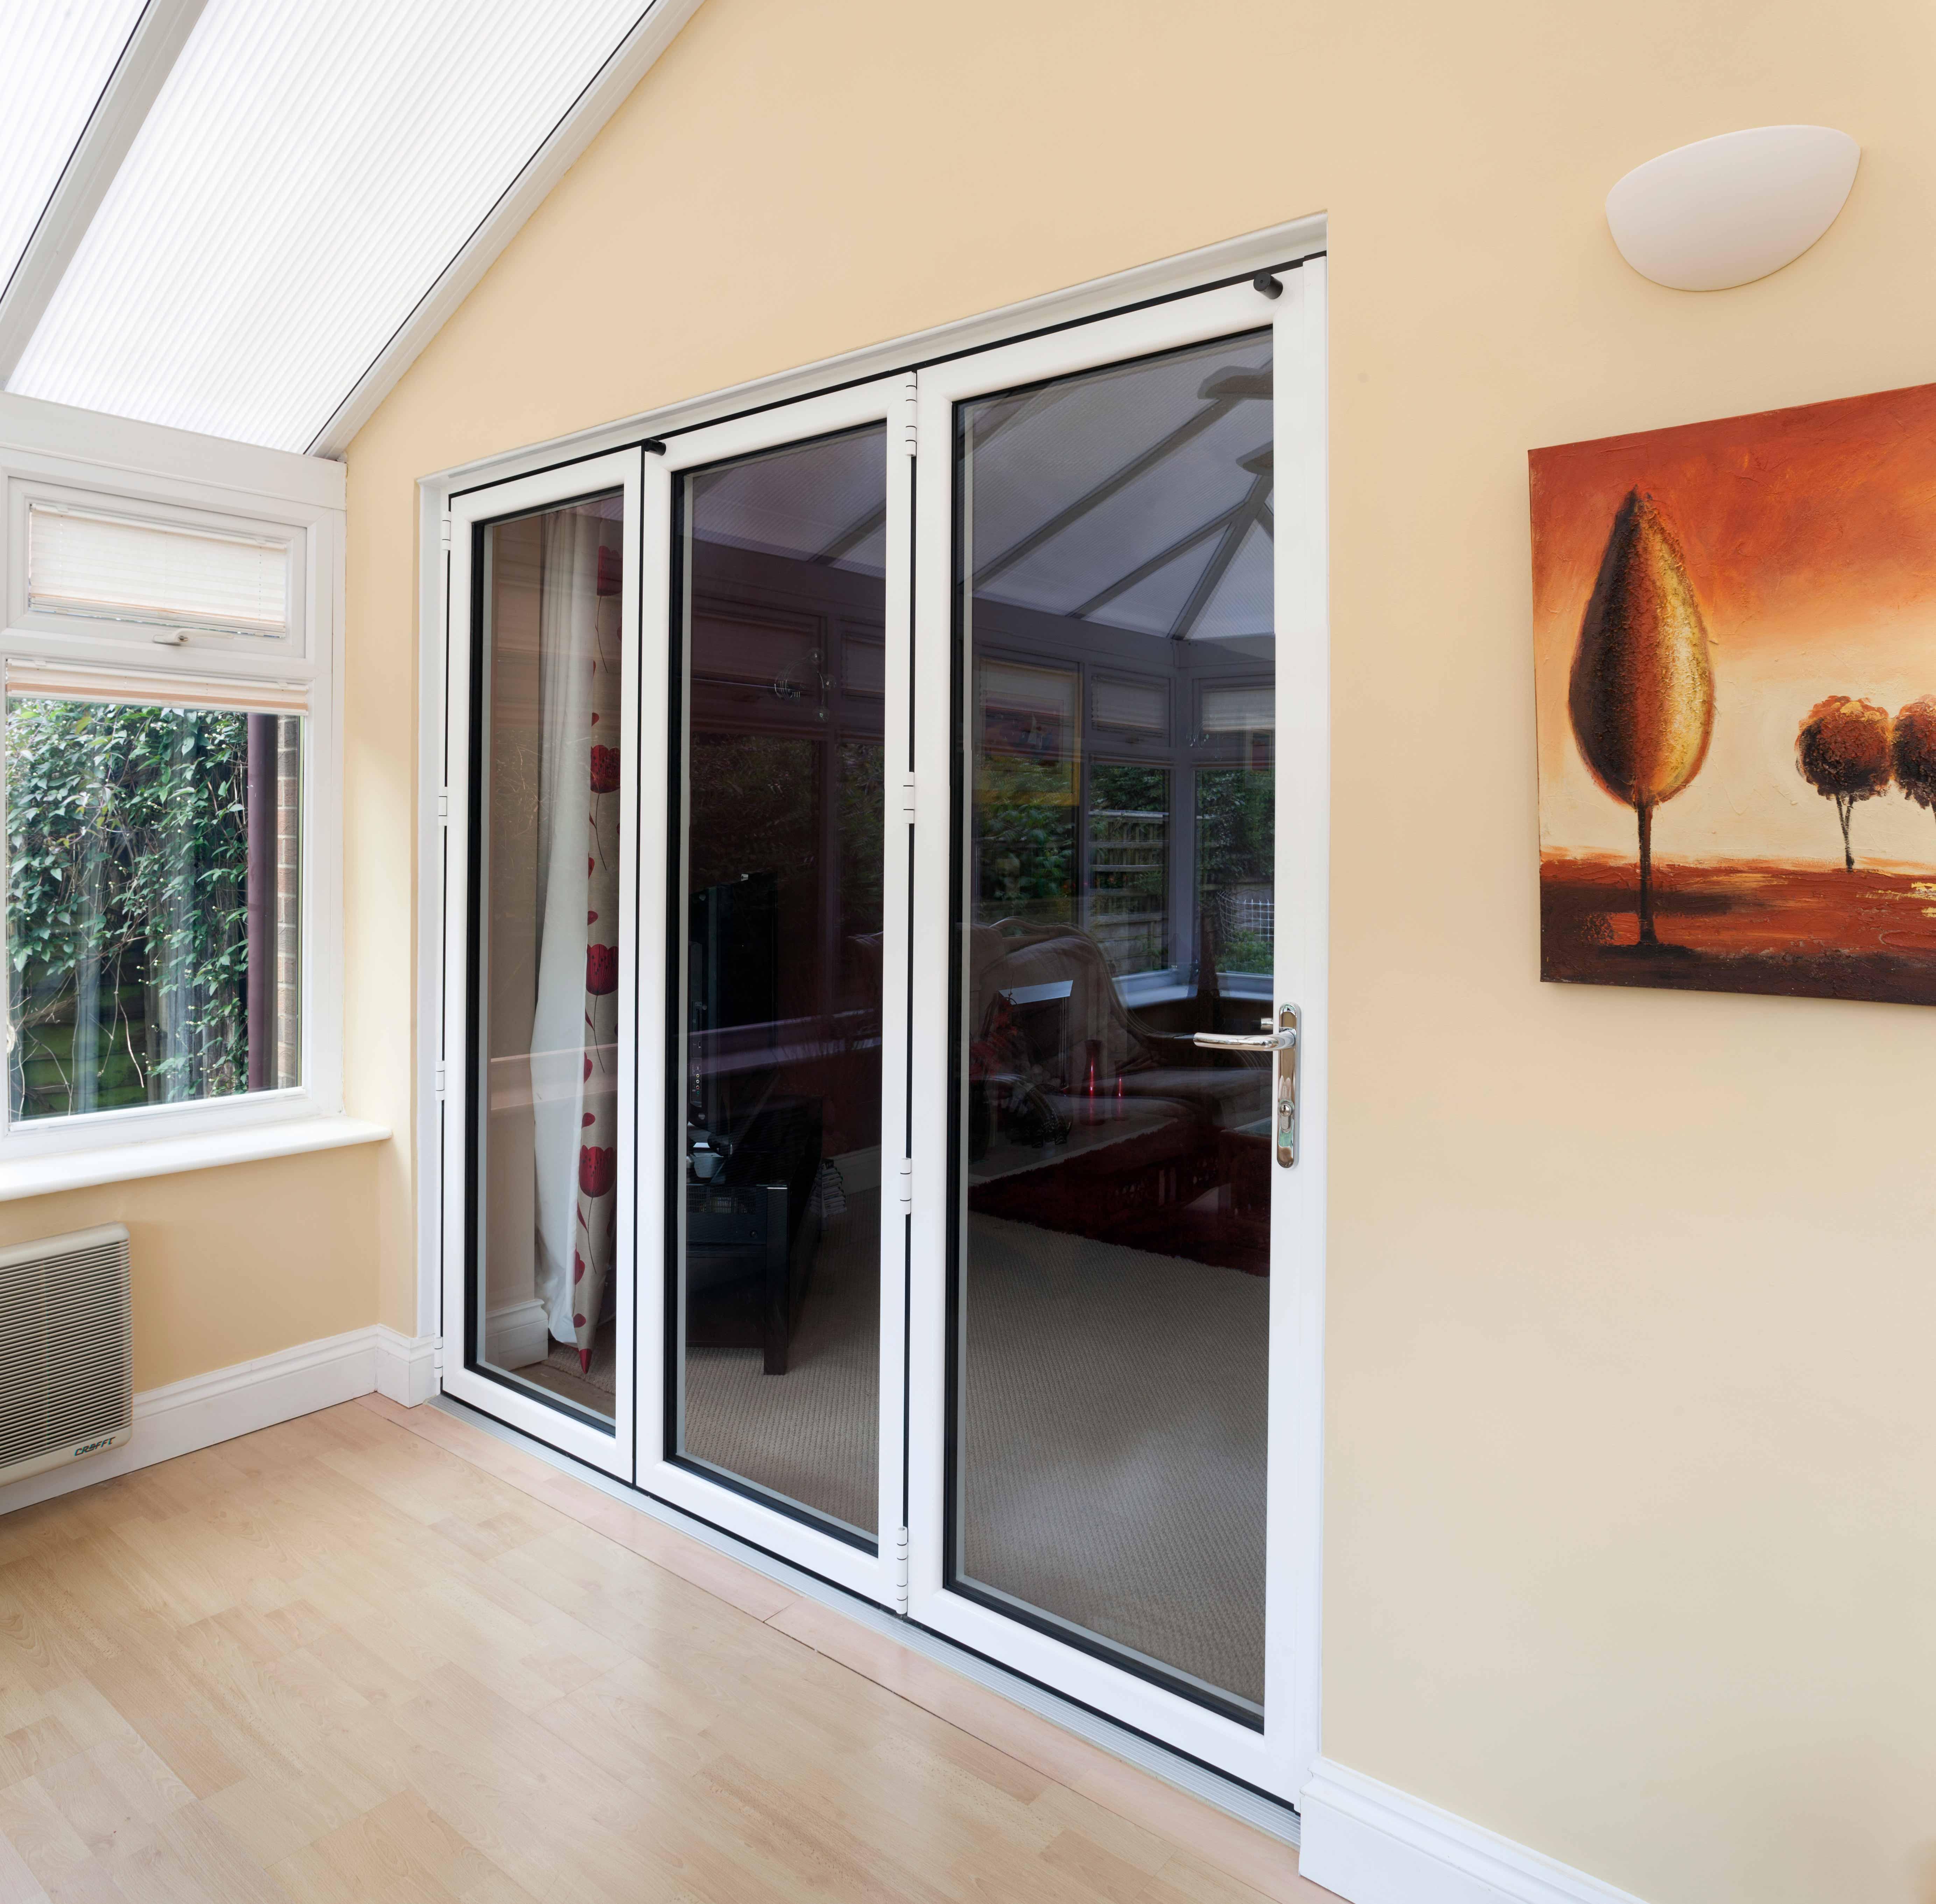 Bi-Fold Doors and UPVC Windows in White